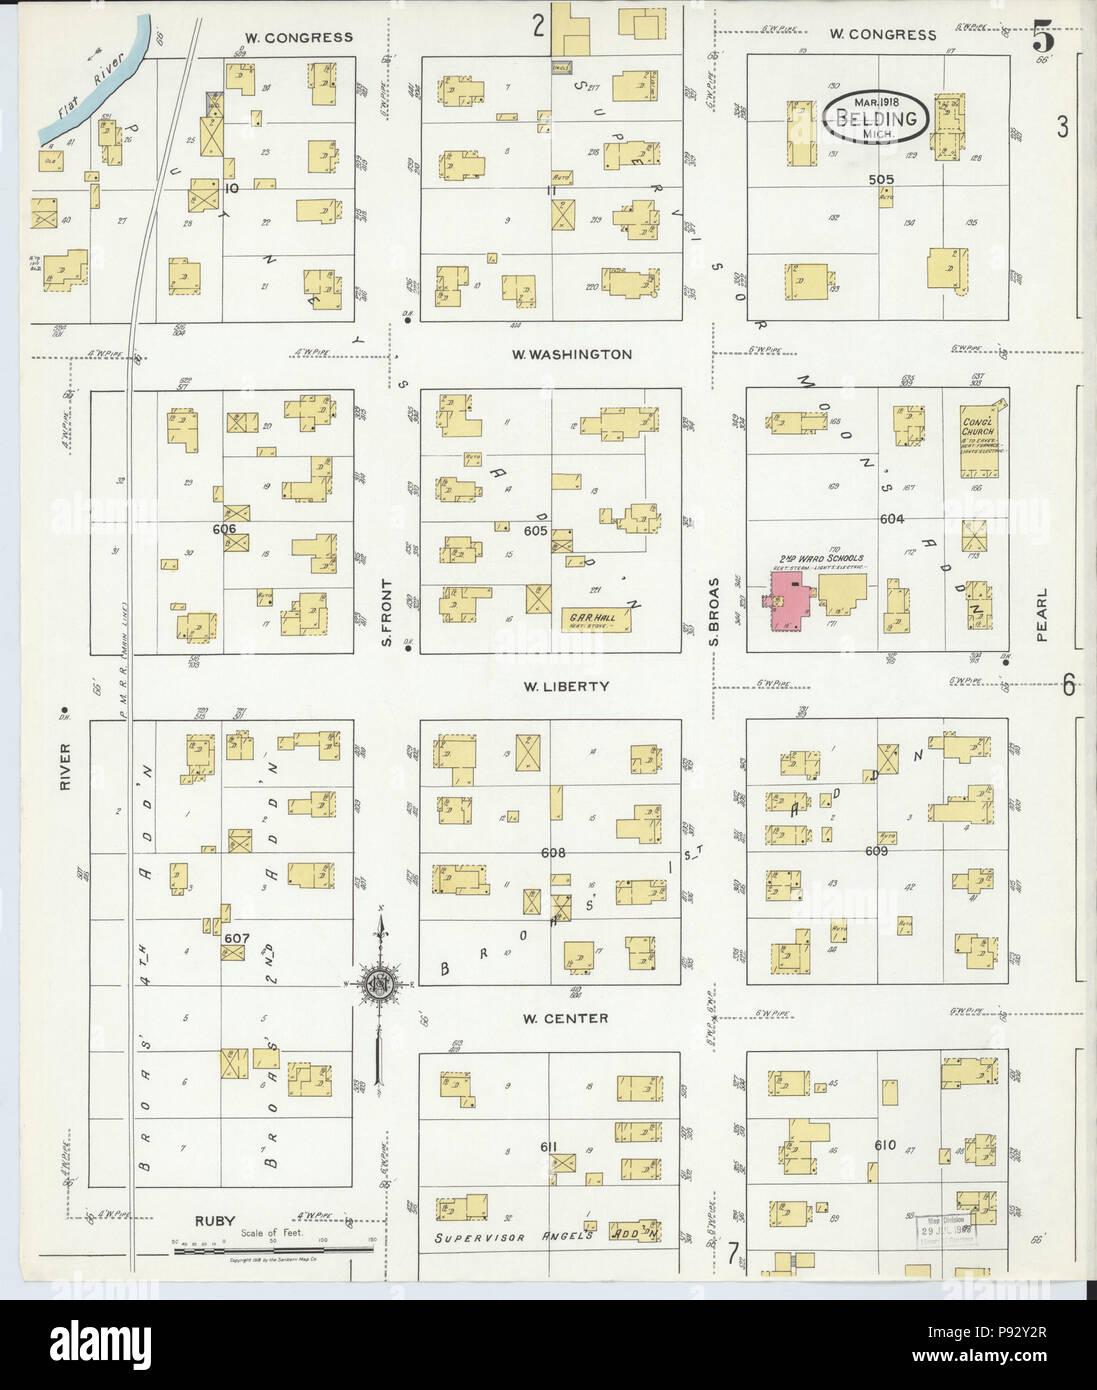 Belding Michigan Map.492 Sanborn Fire Insurance Map From Belding Montcalm County